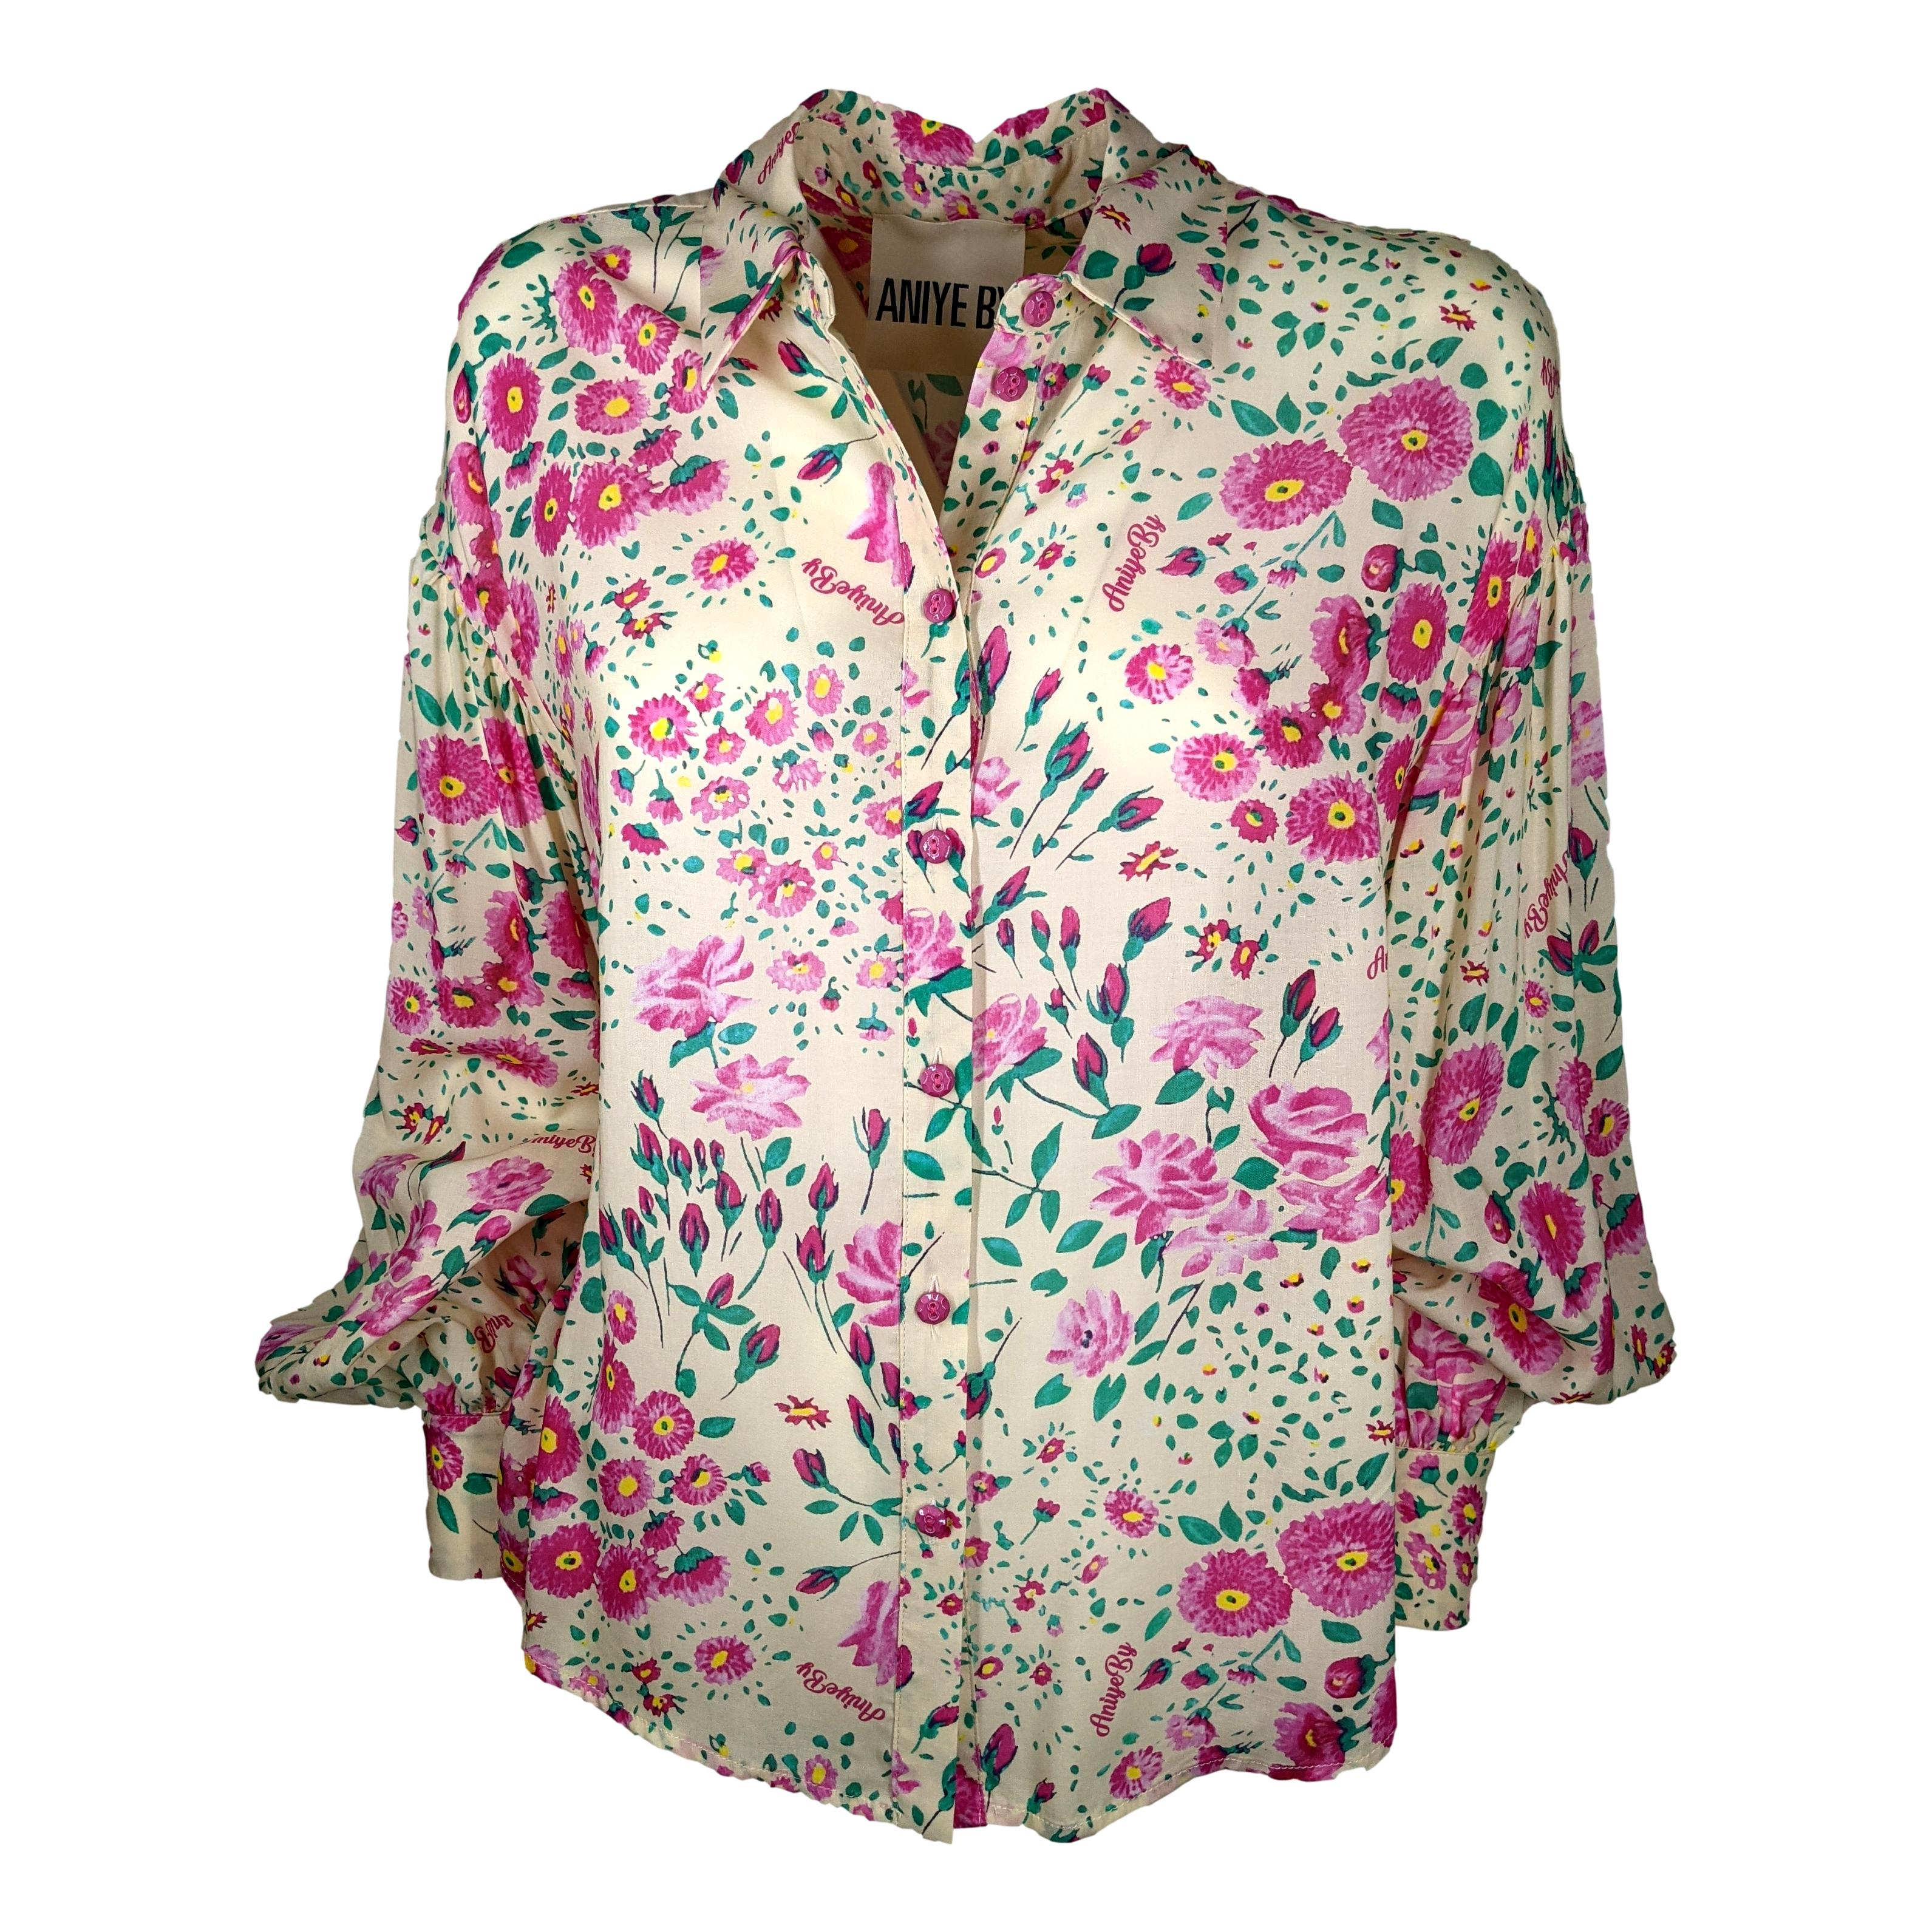 isabel shirt ANIYE BY |  | 18576502026